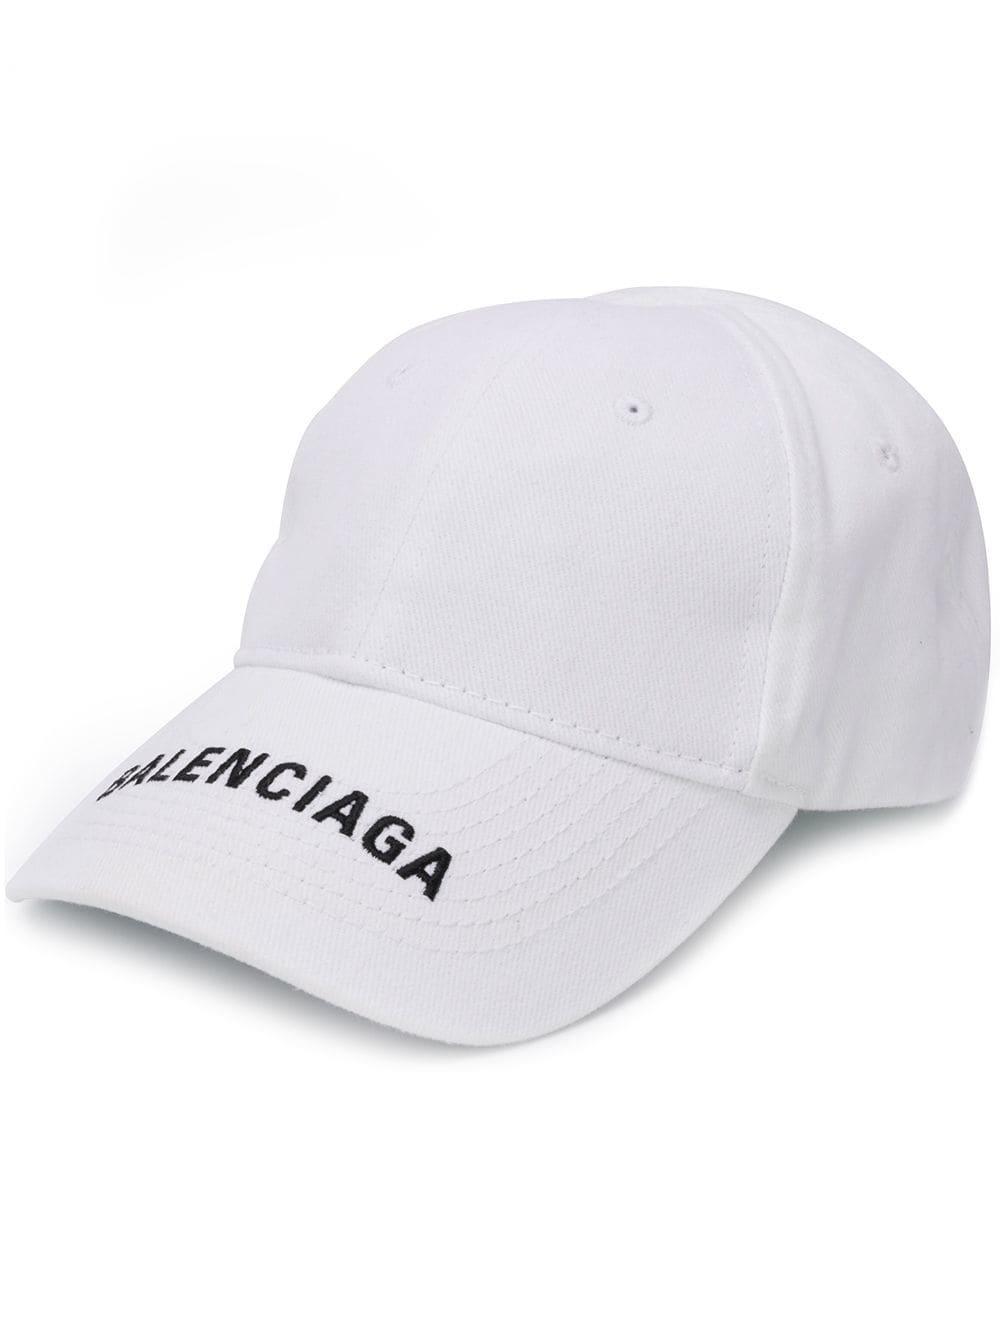 6d3bf160597 Lyst - Balenciaga Embroidered Logo Cap in White